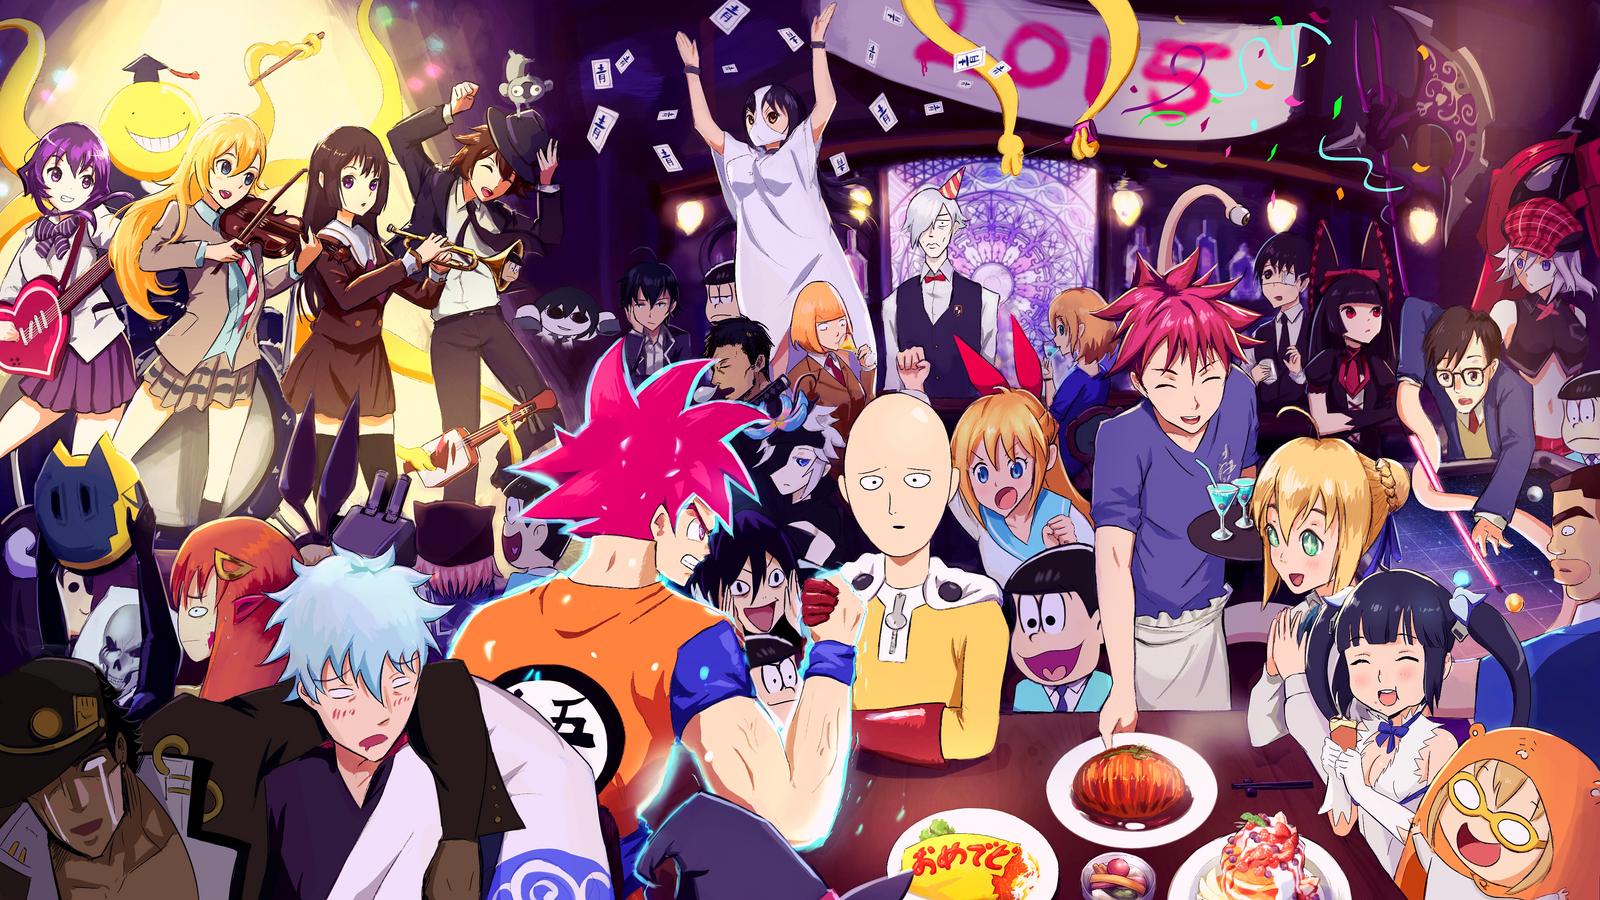 2015 Anime by QOSiC